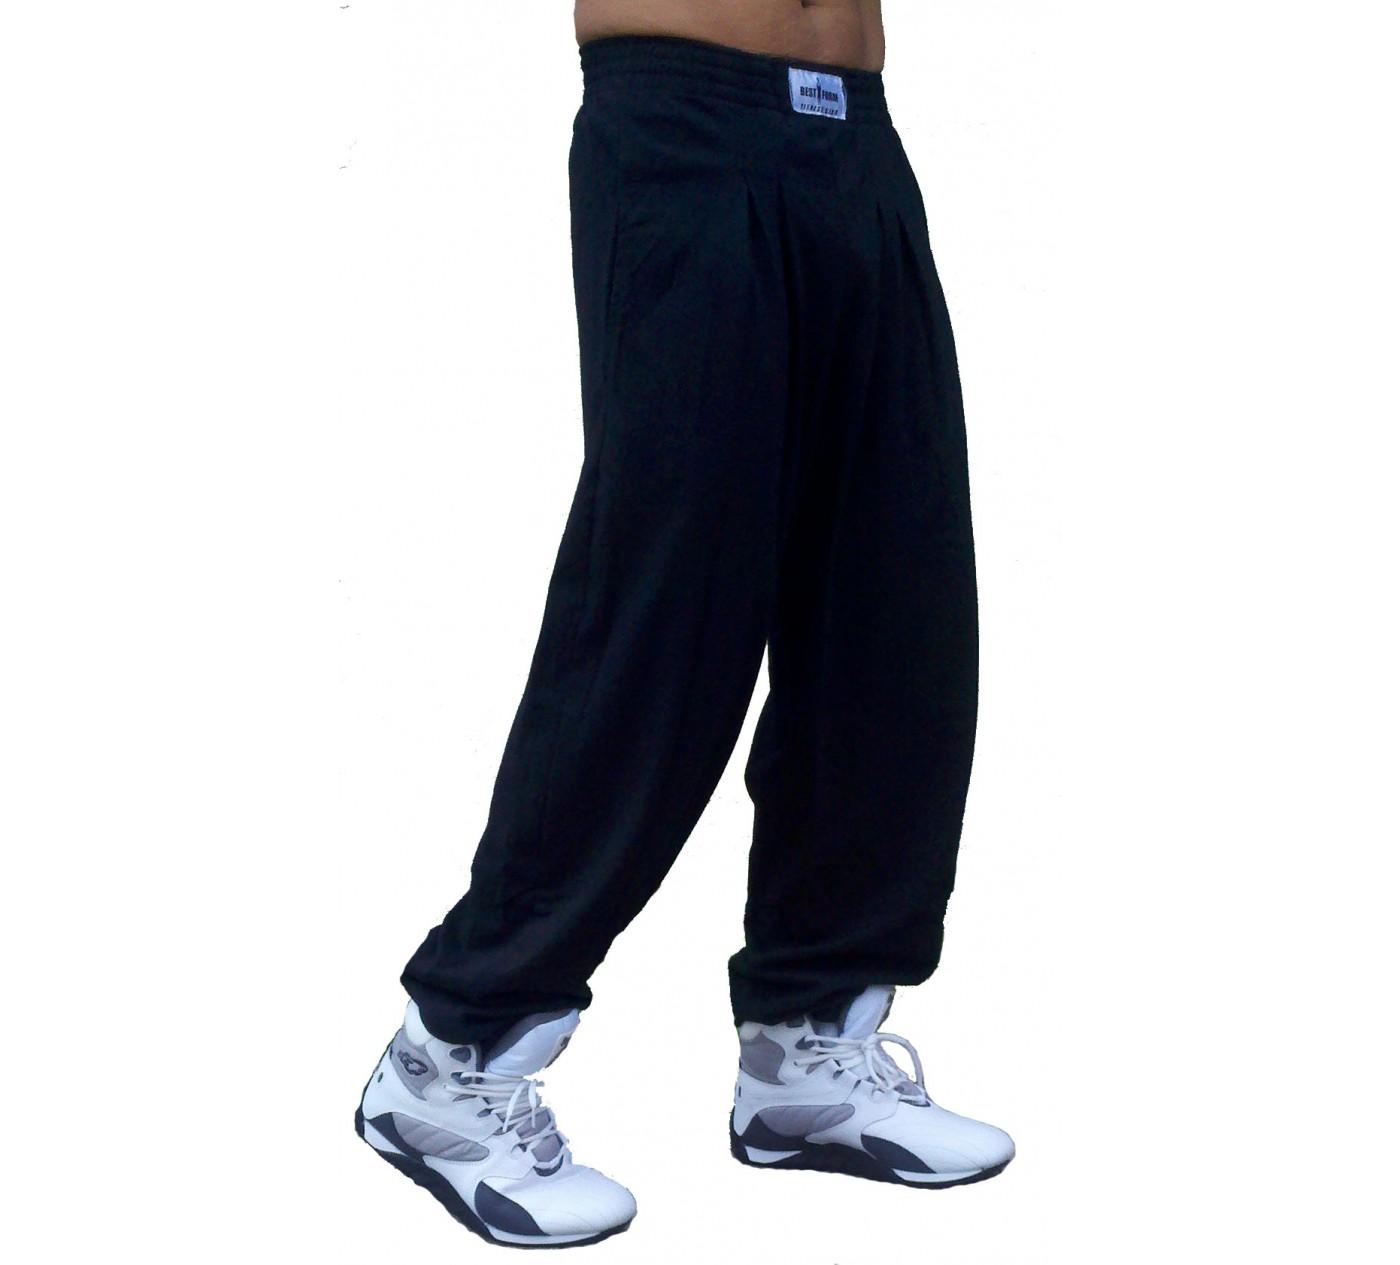 F500 Baggy Egzersiz Pantolonu En İyi Form